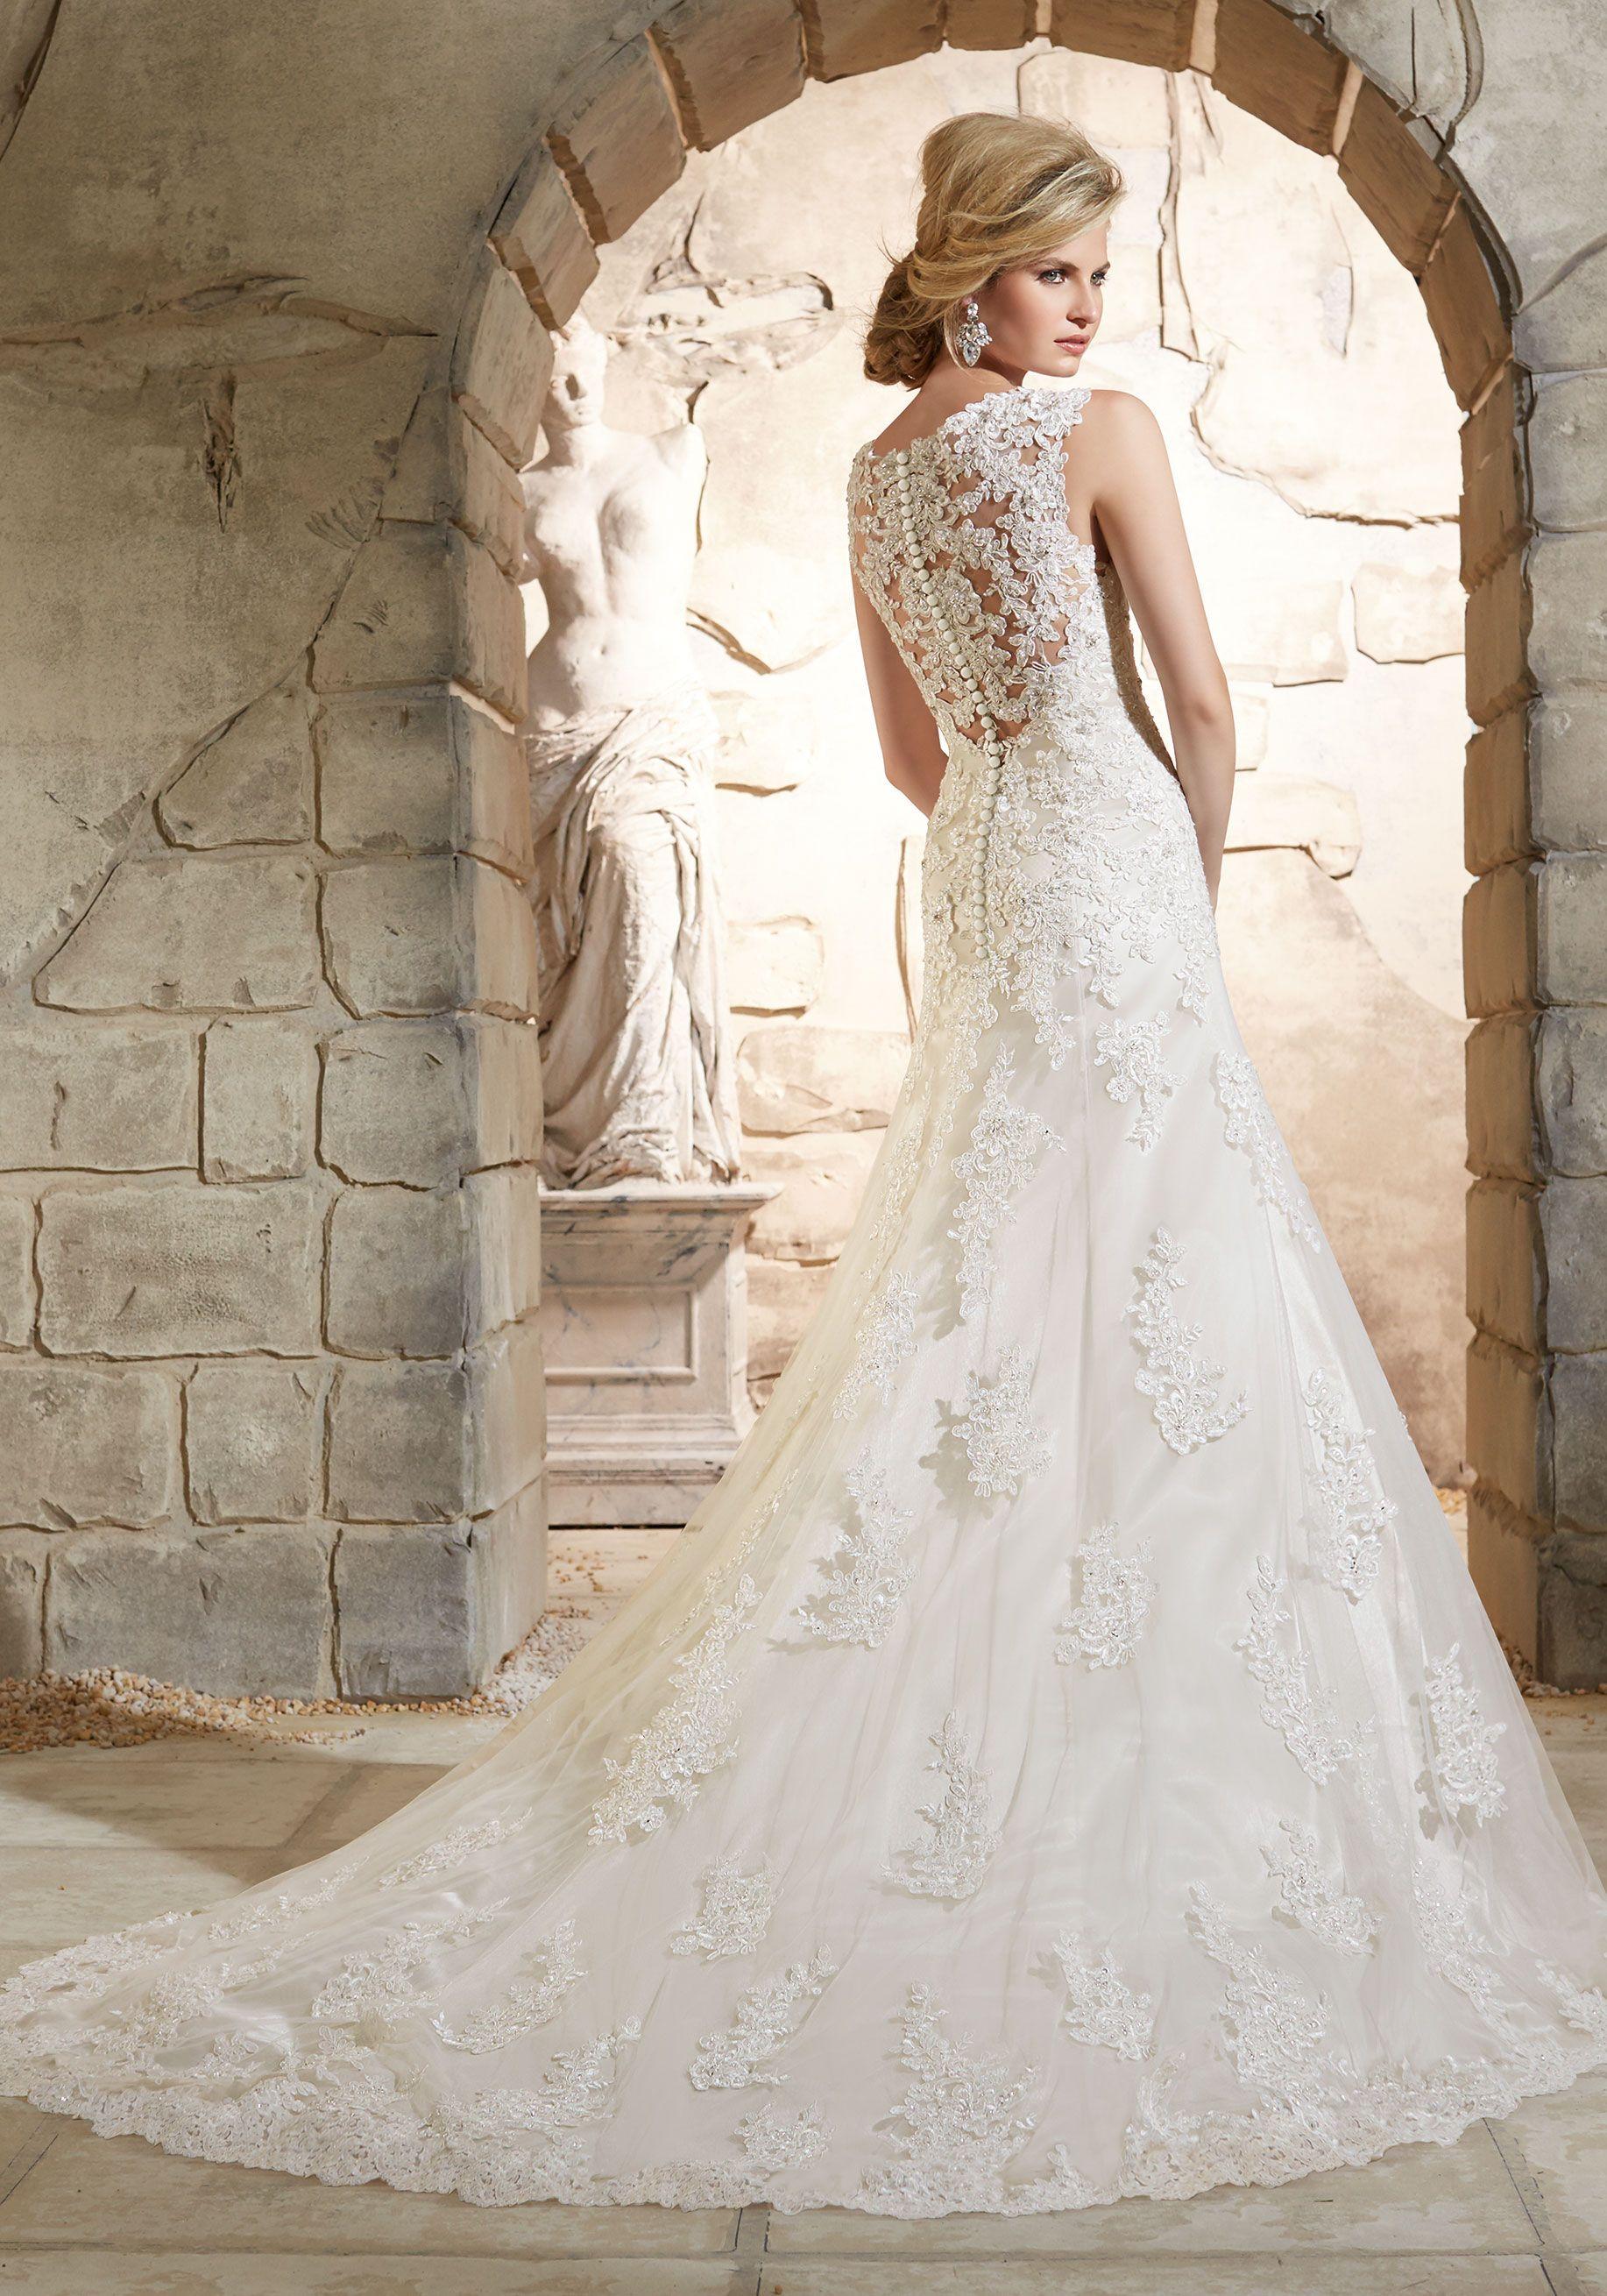 Wedding Dresses For Over 50\'s Bride Uk | Midway Media